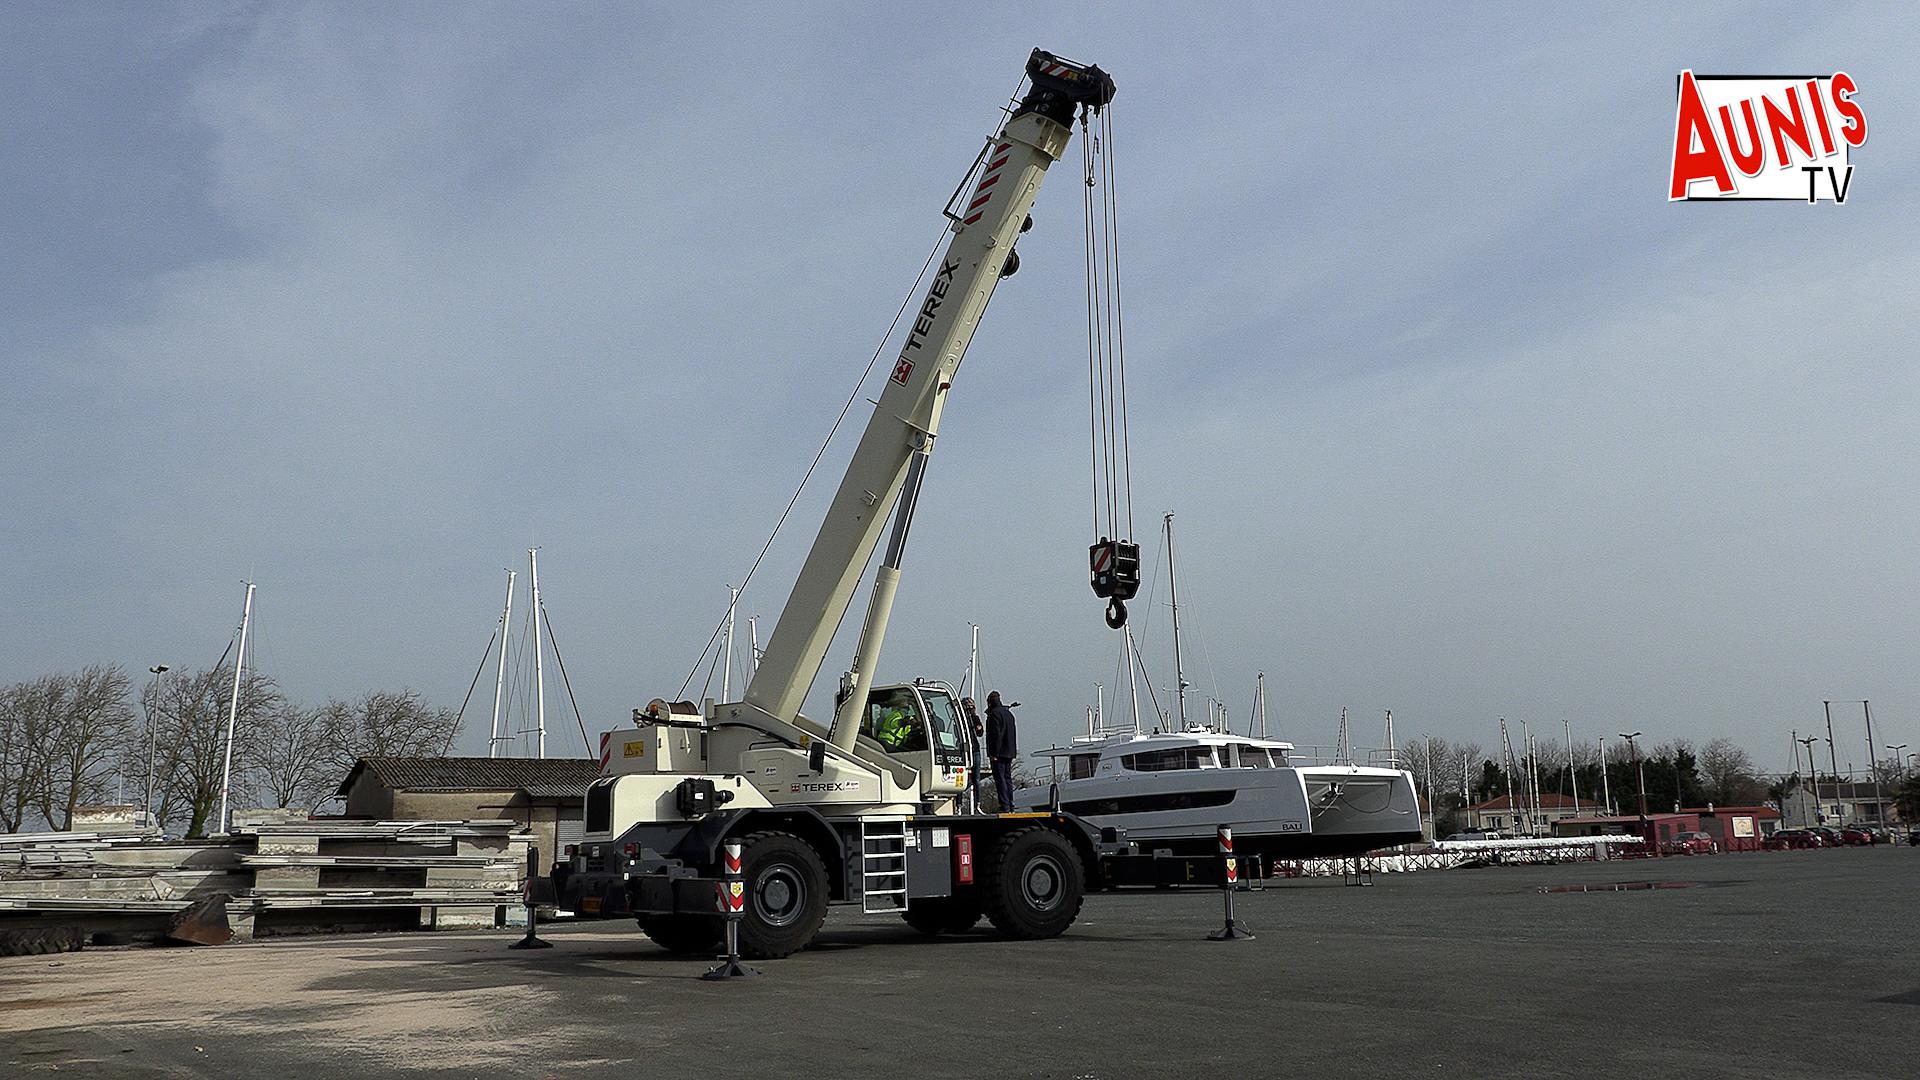 Grue port de Marans Charente Maritime AunisTV